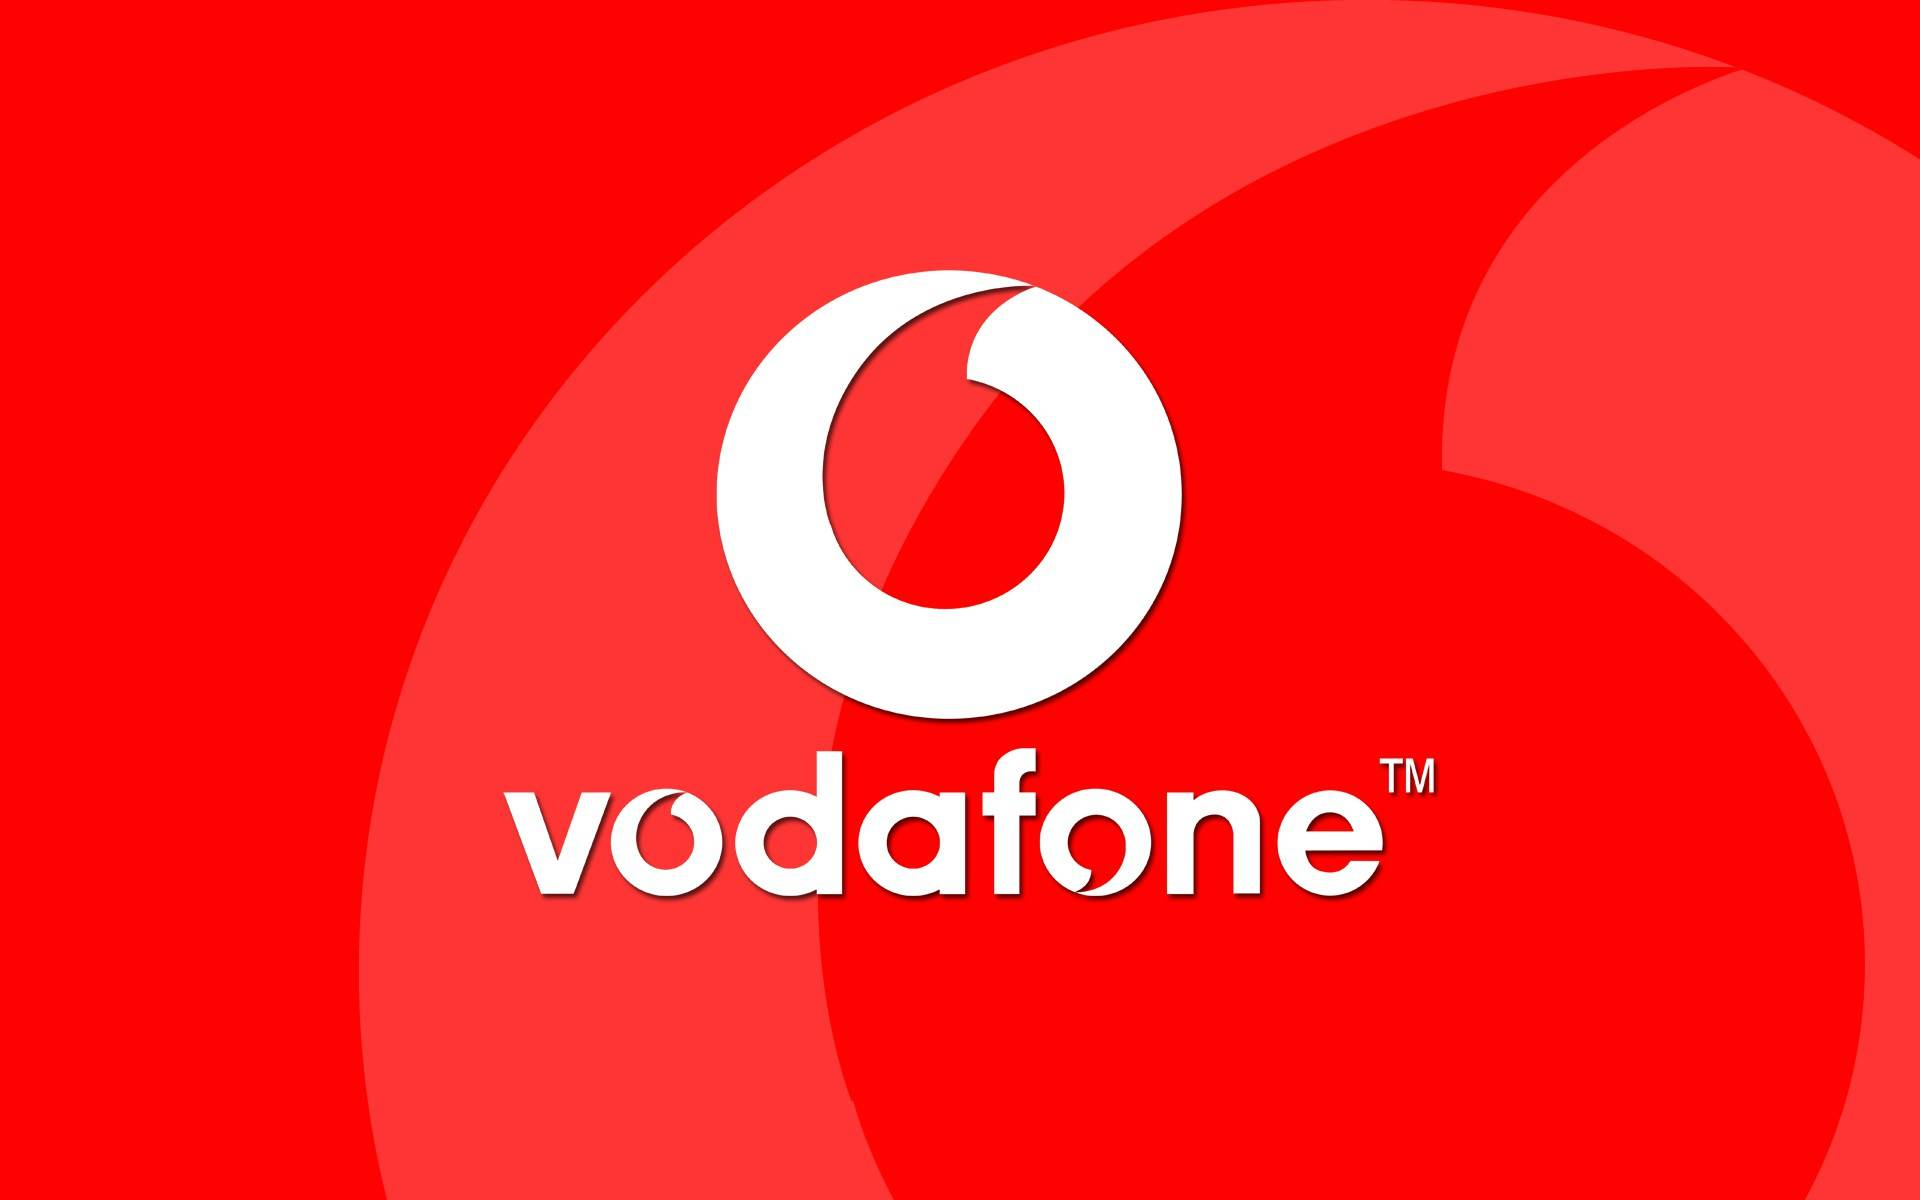 Vodafone fabulos